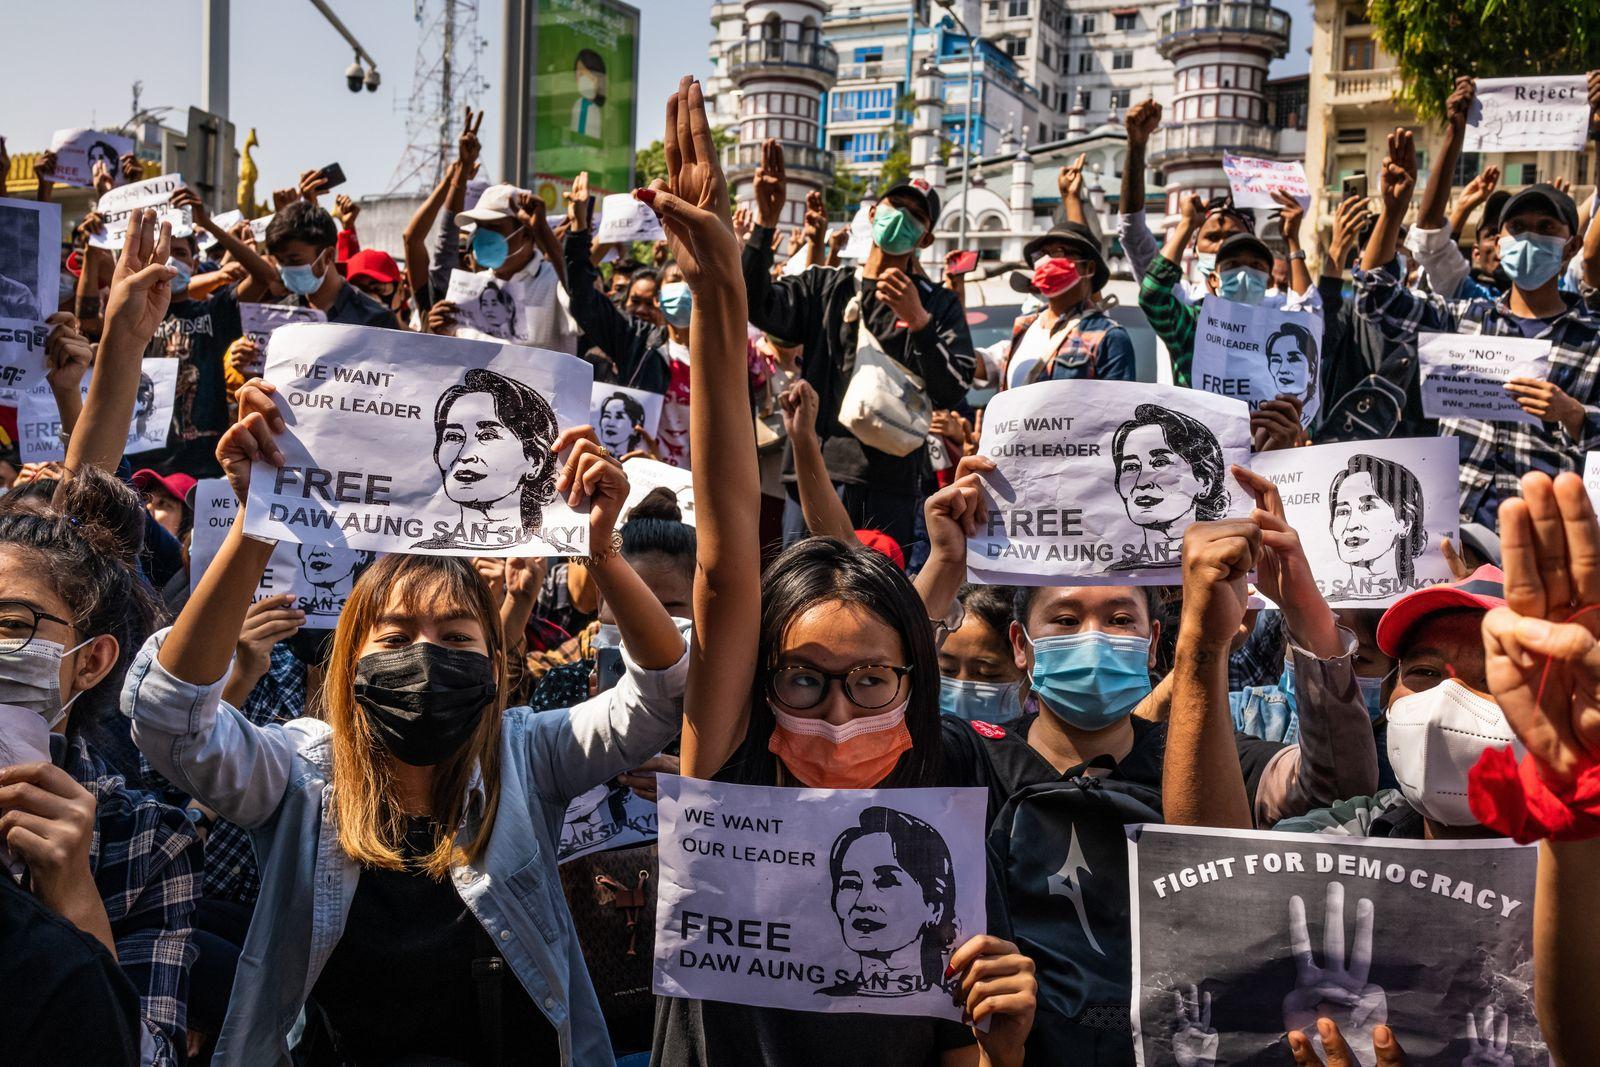 Protesters Block Roads As Civil Disobedience Grows in Myanmar